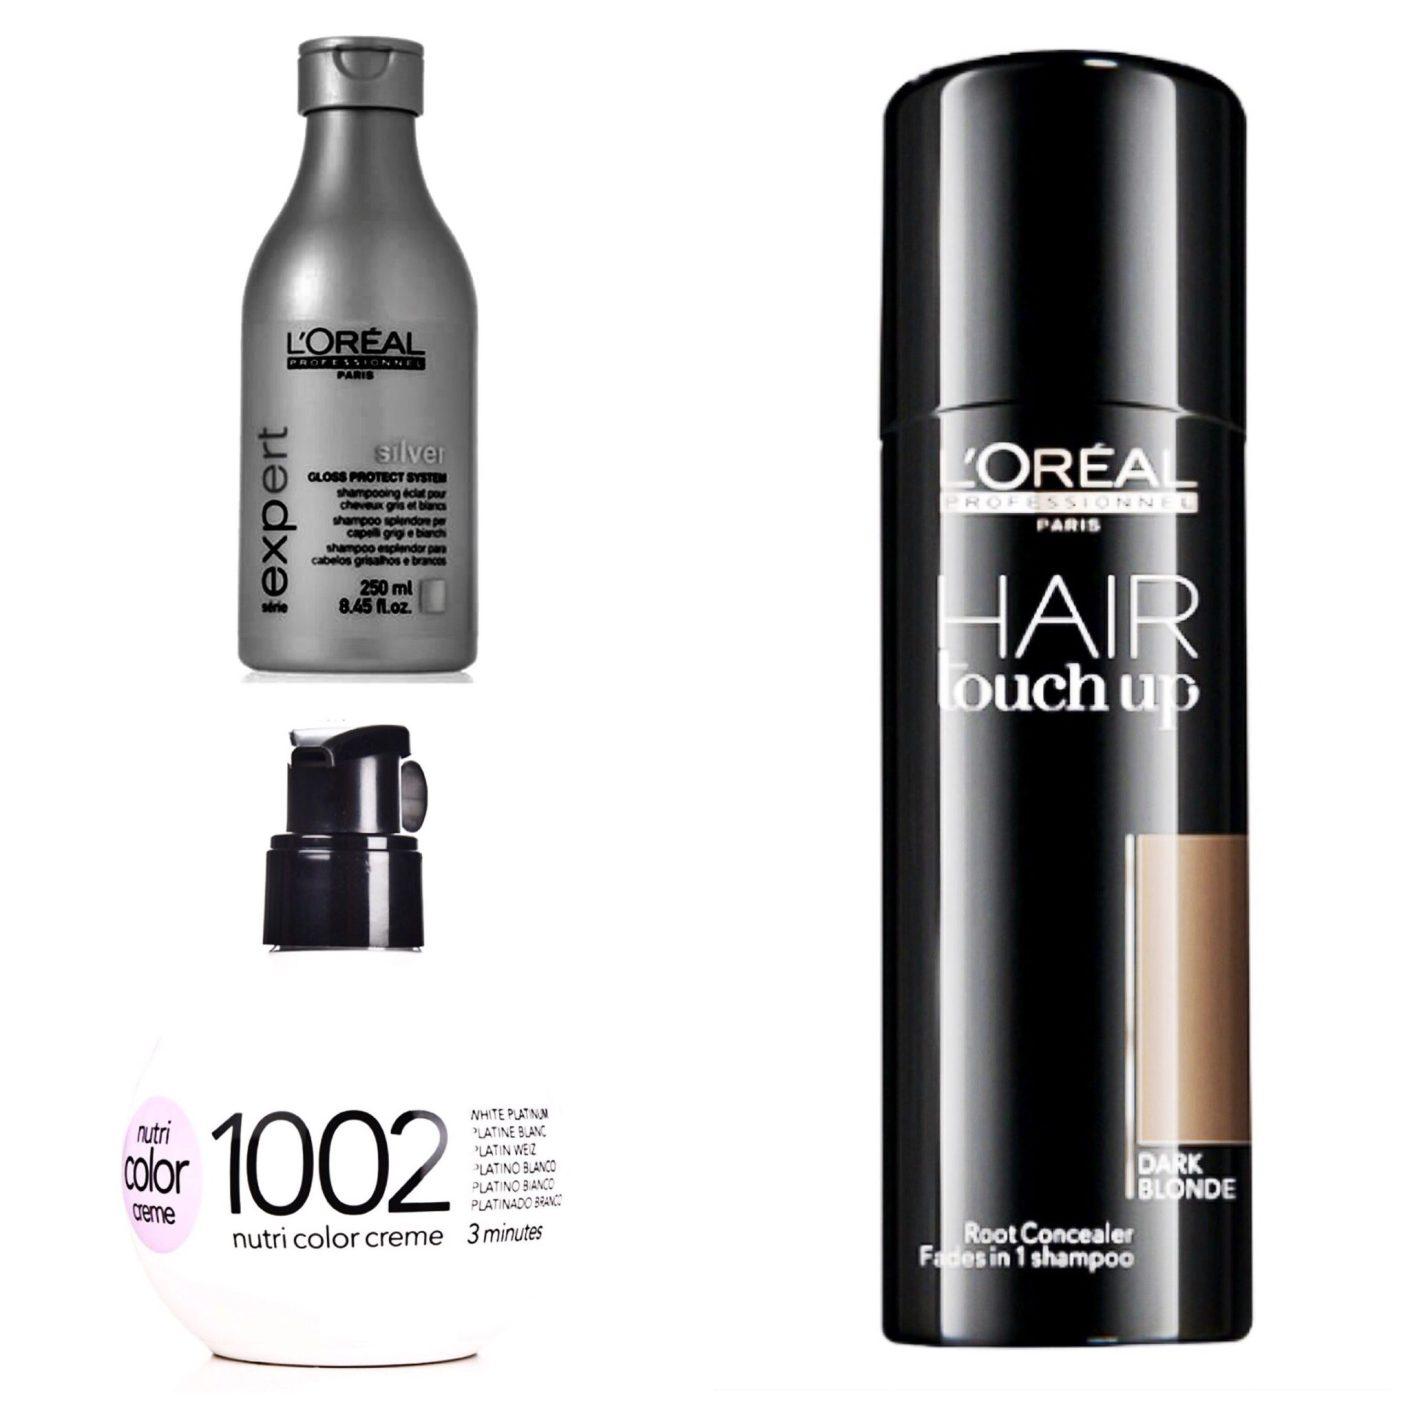 produkter til gråt hår